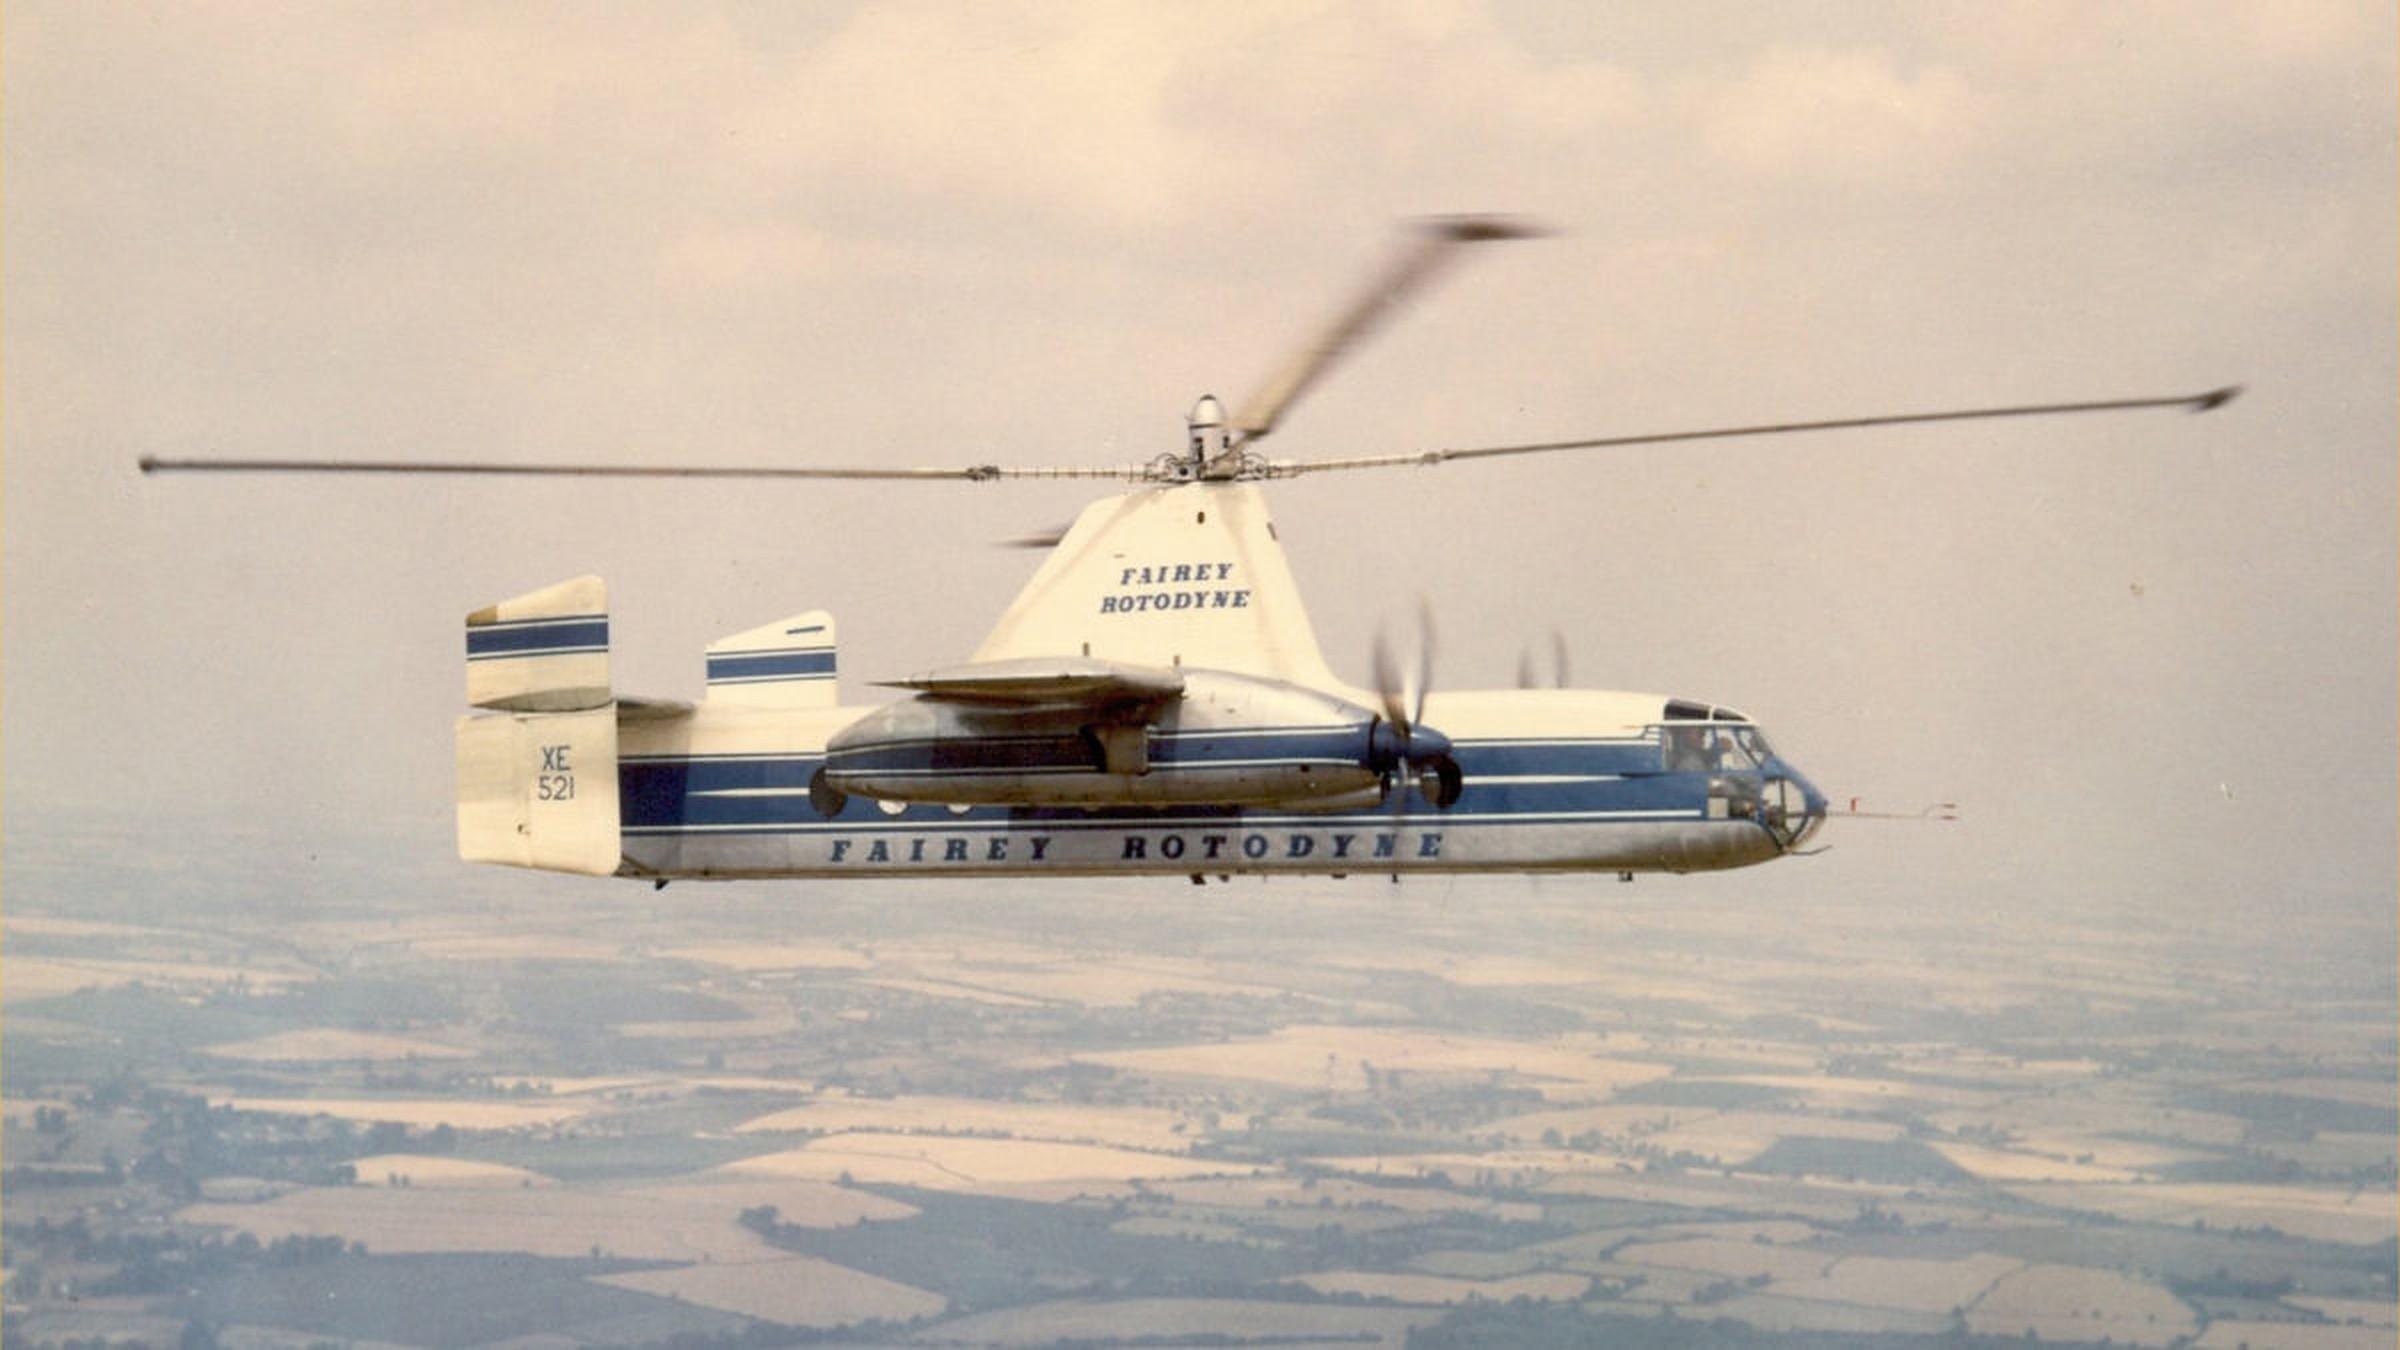 Fairey Rotodyne Skybus